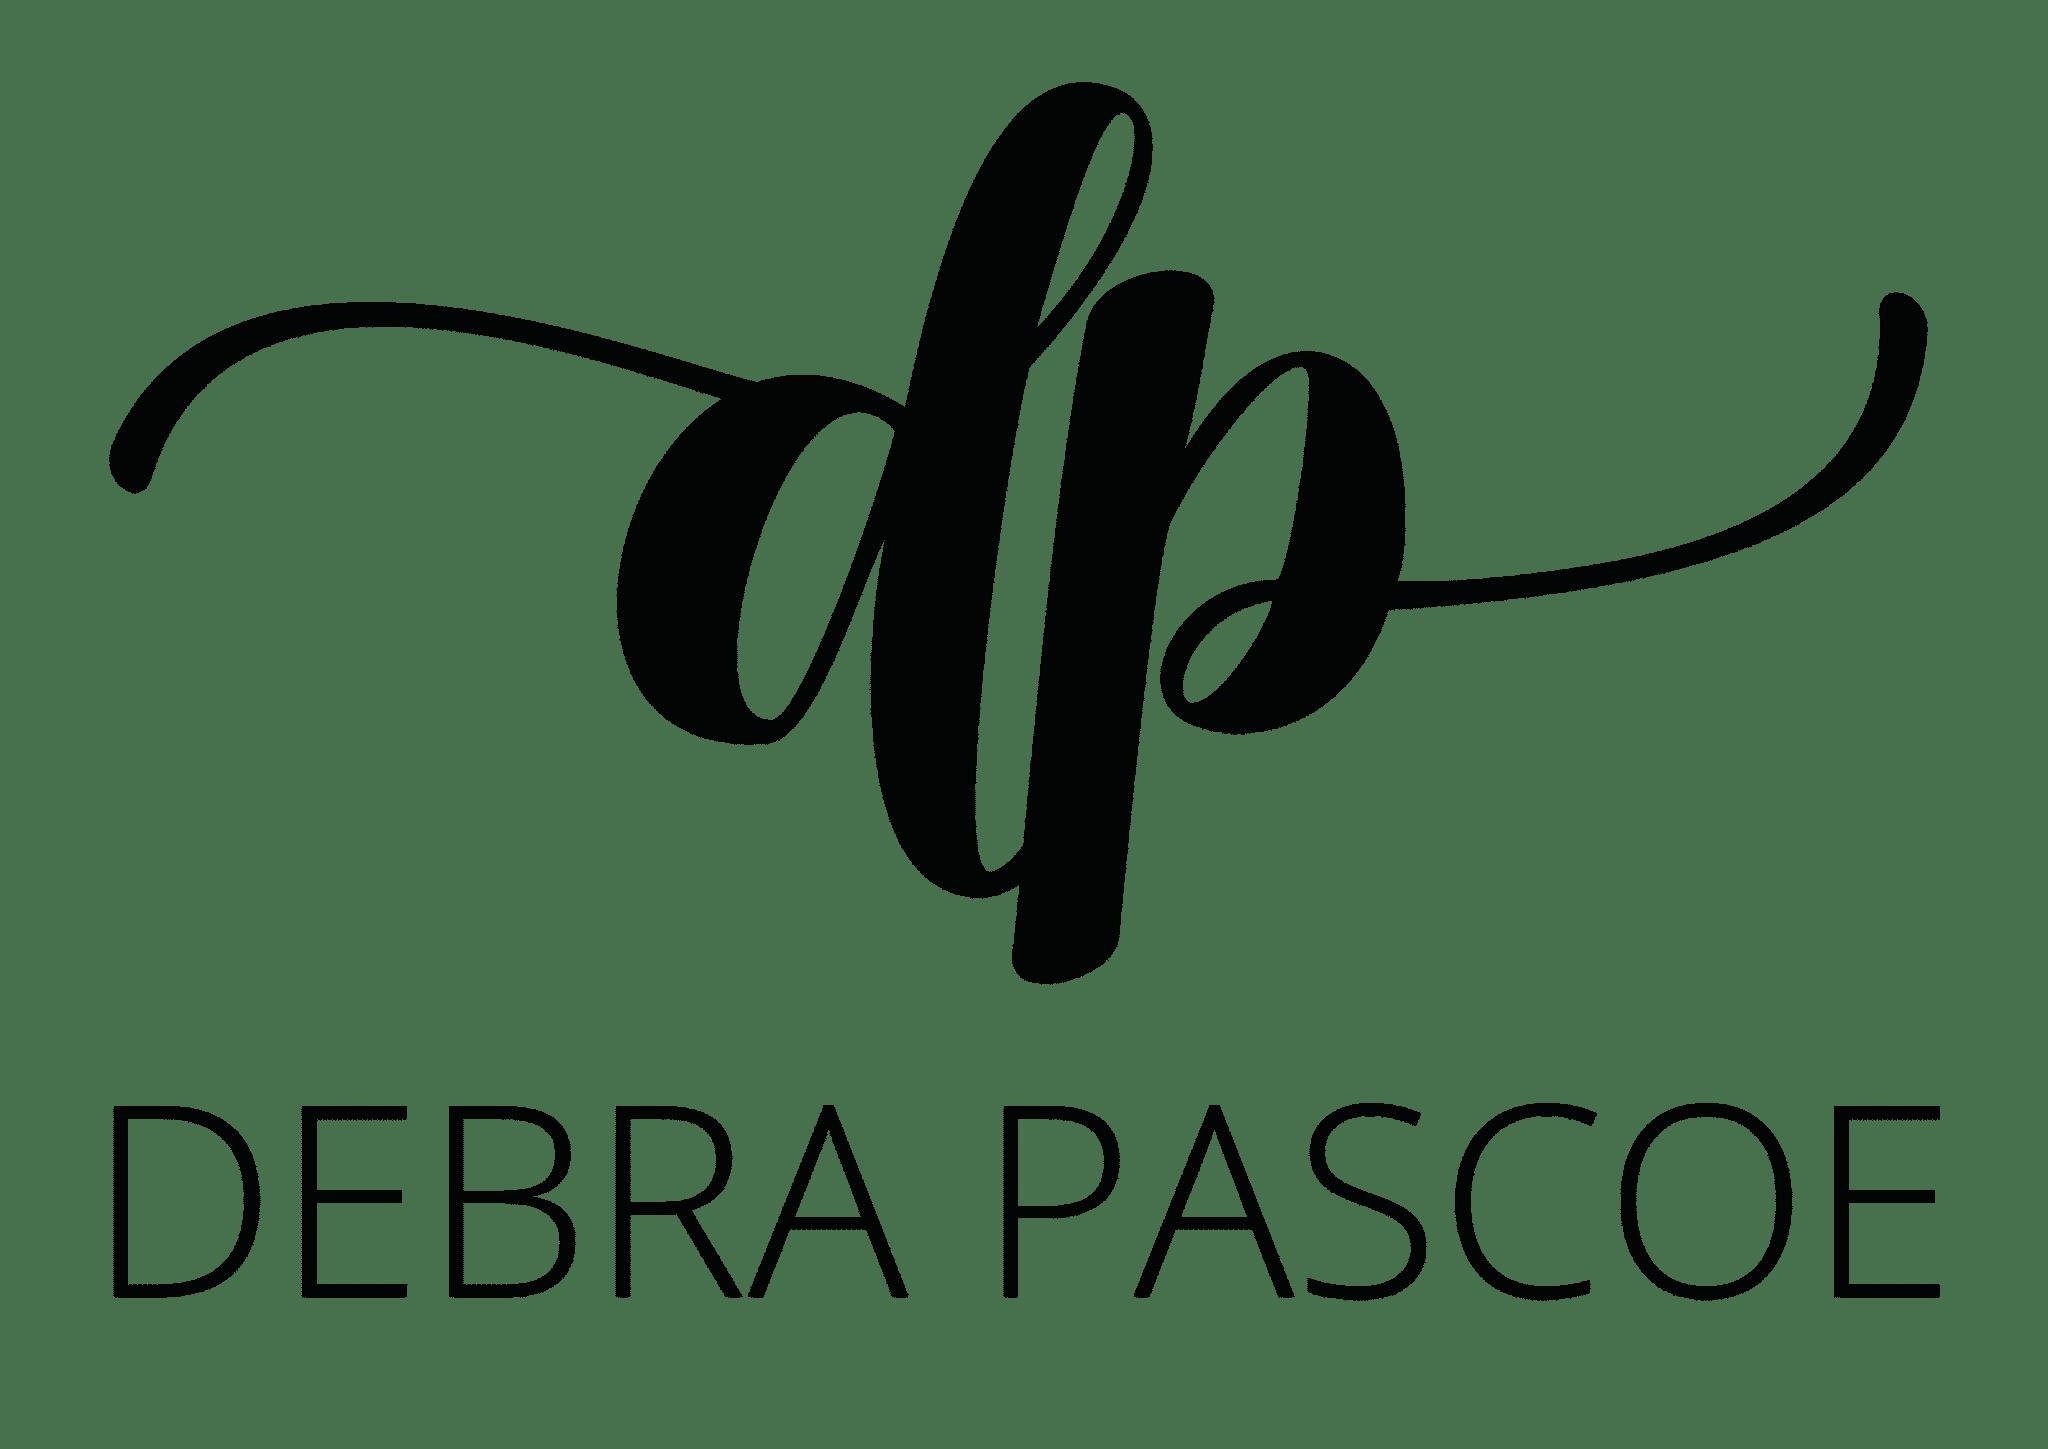 Debra Pascoe logo